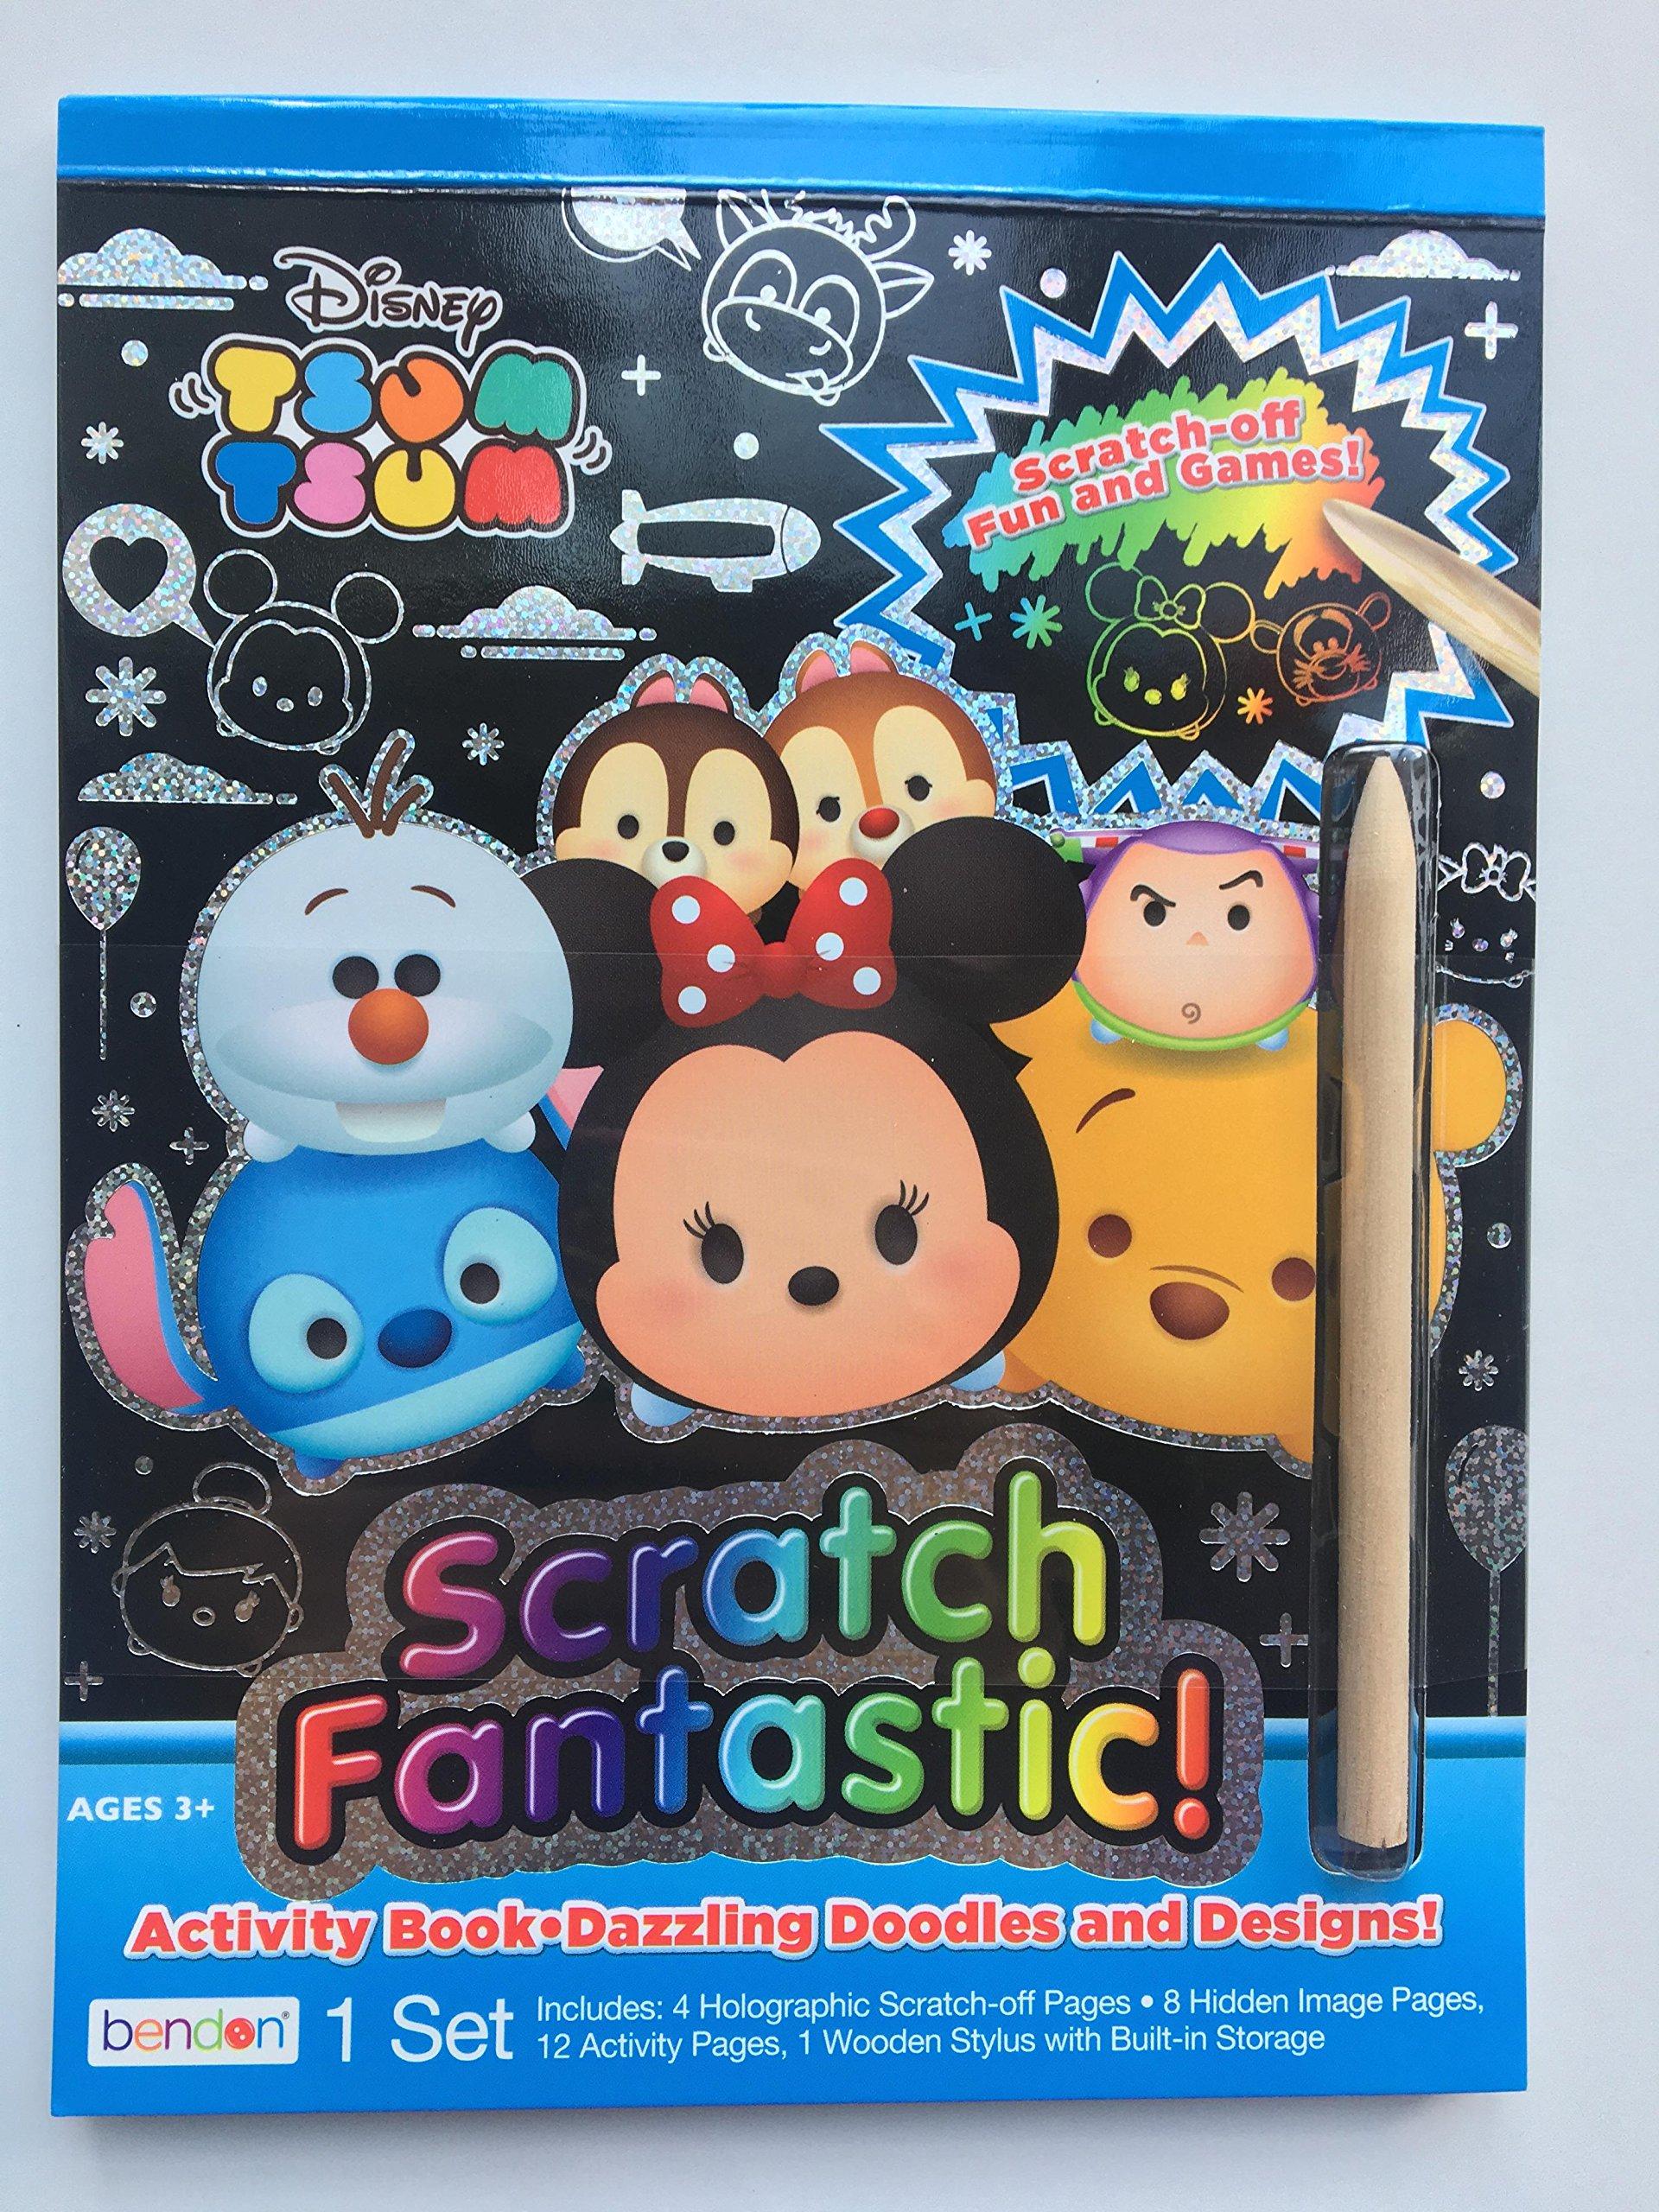 Disney Vampirina Scratch Fantastic Activity Book 12 Scratch-Off Activity Pages Bendon